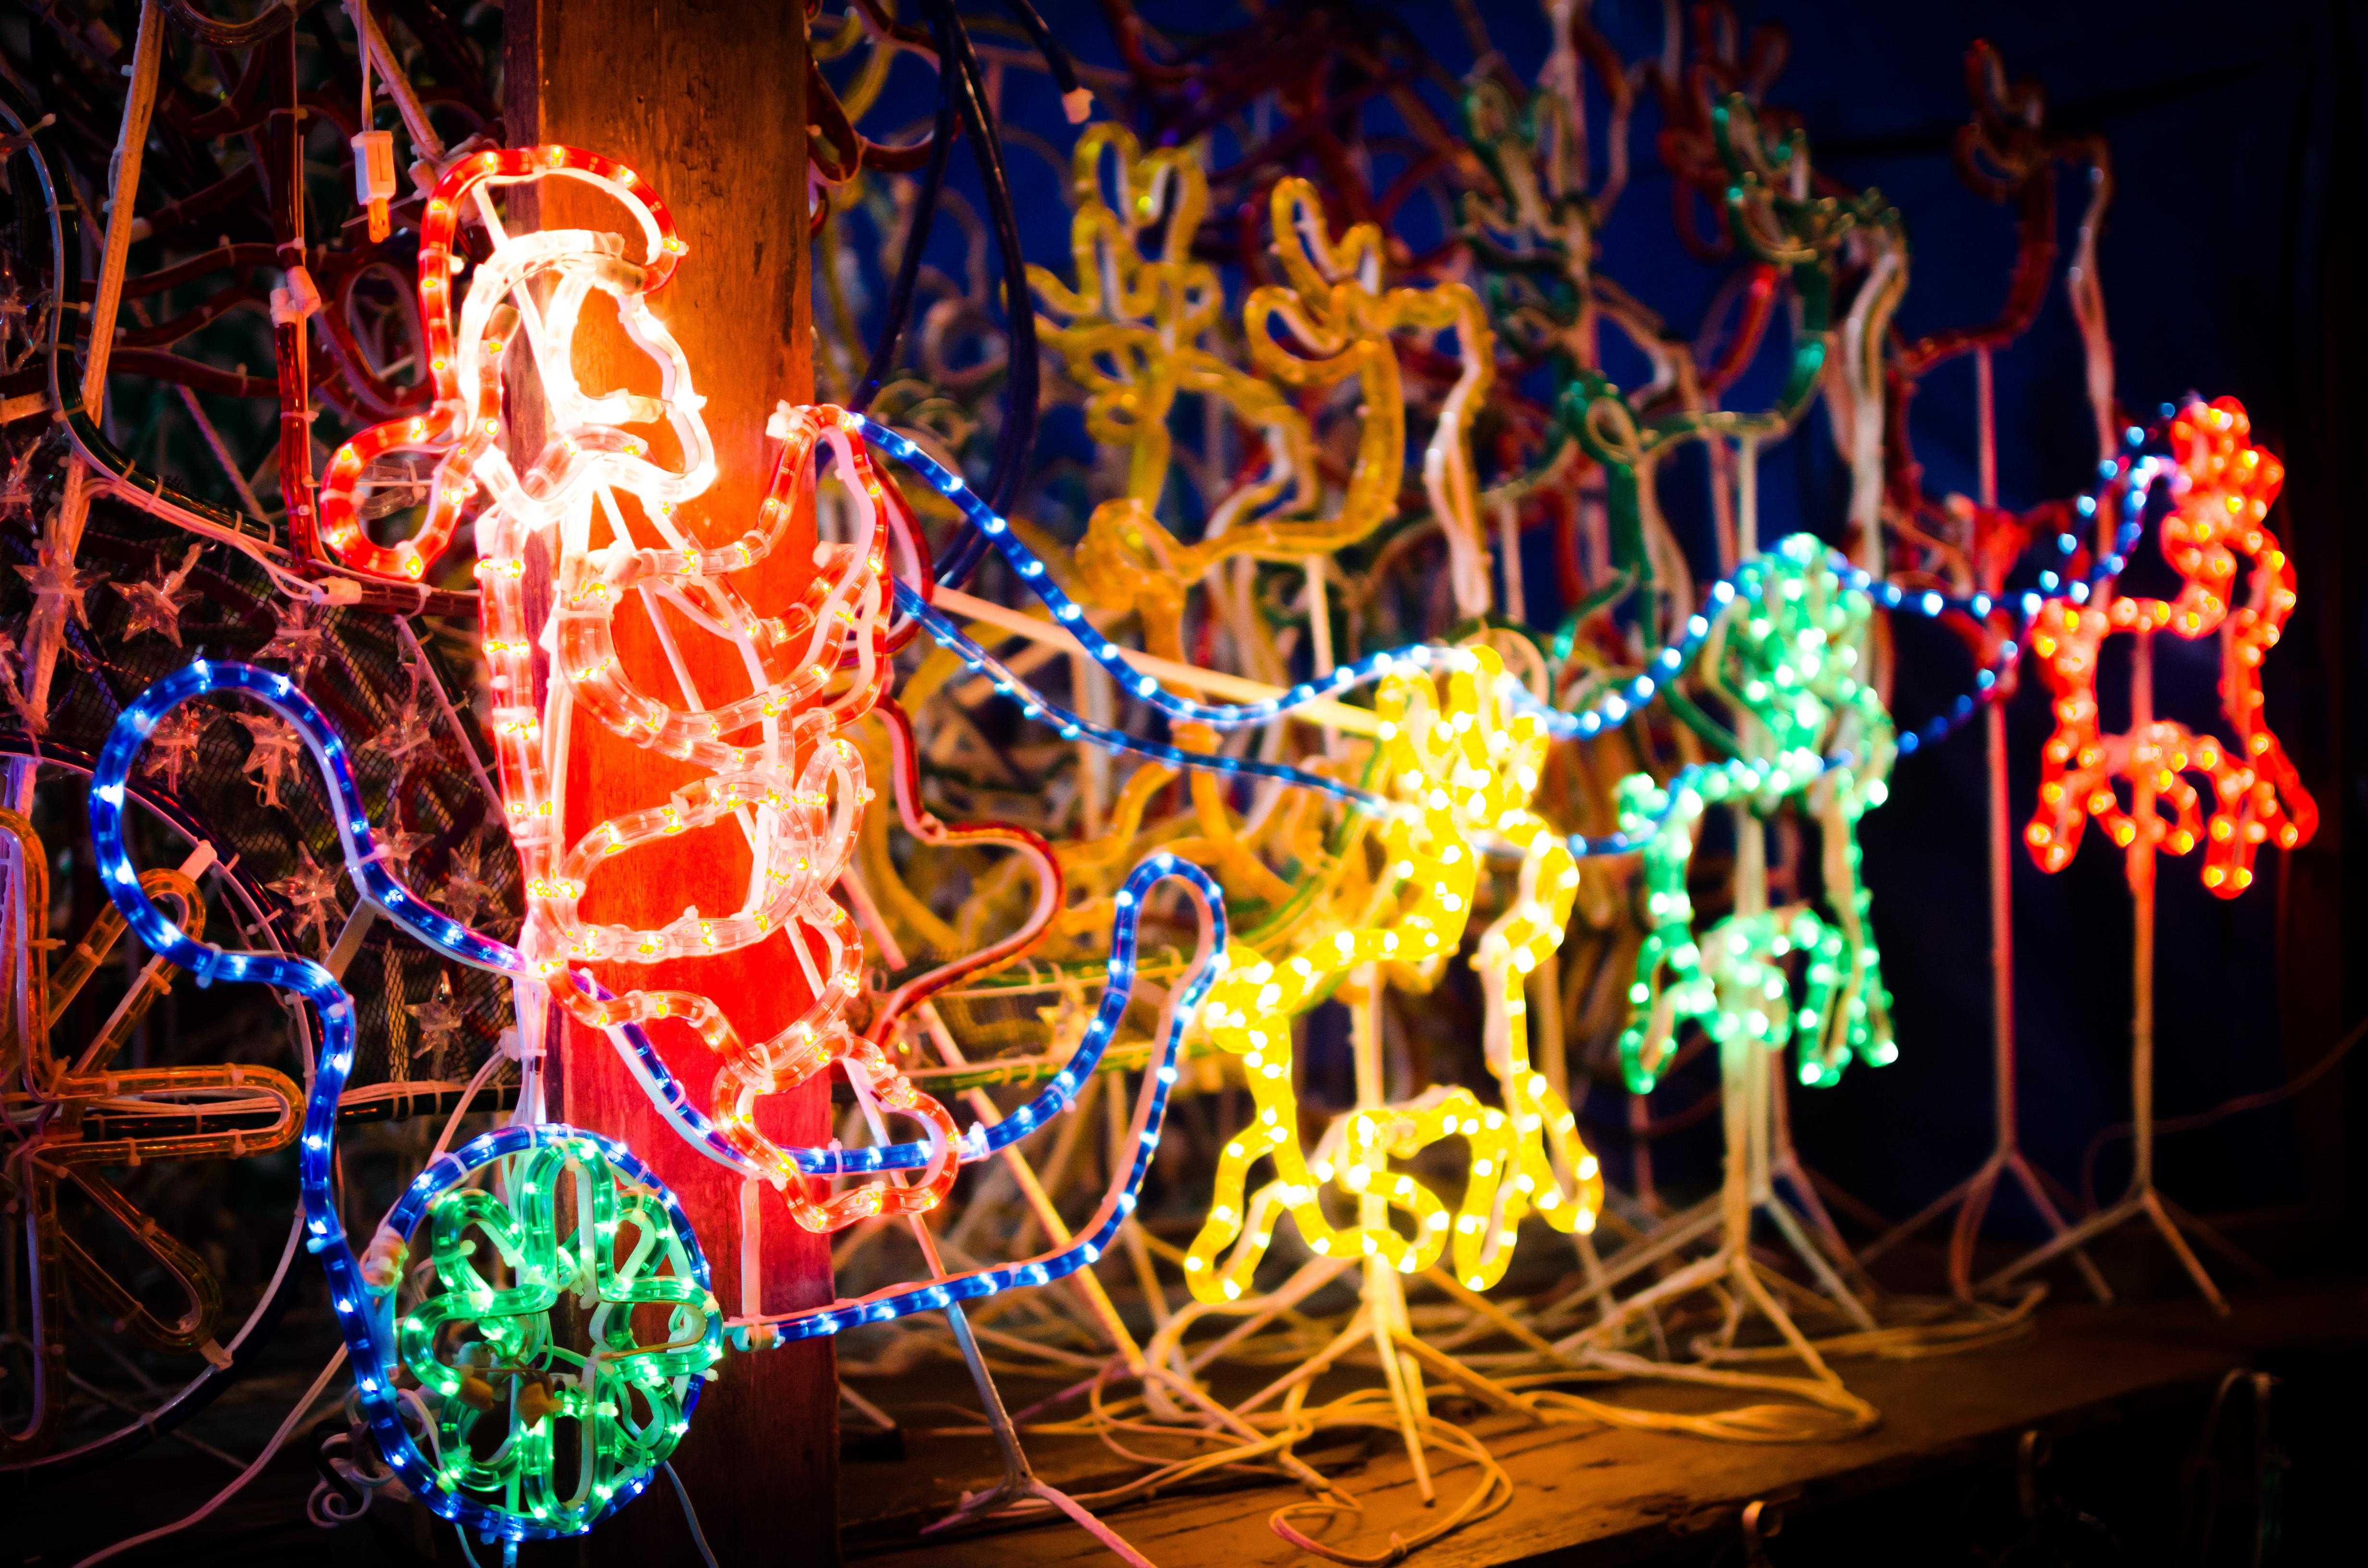 shutterstock_501695674 - Deerfield Plano Christmas Lights